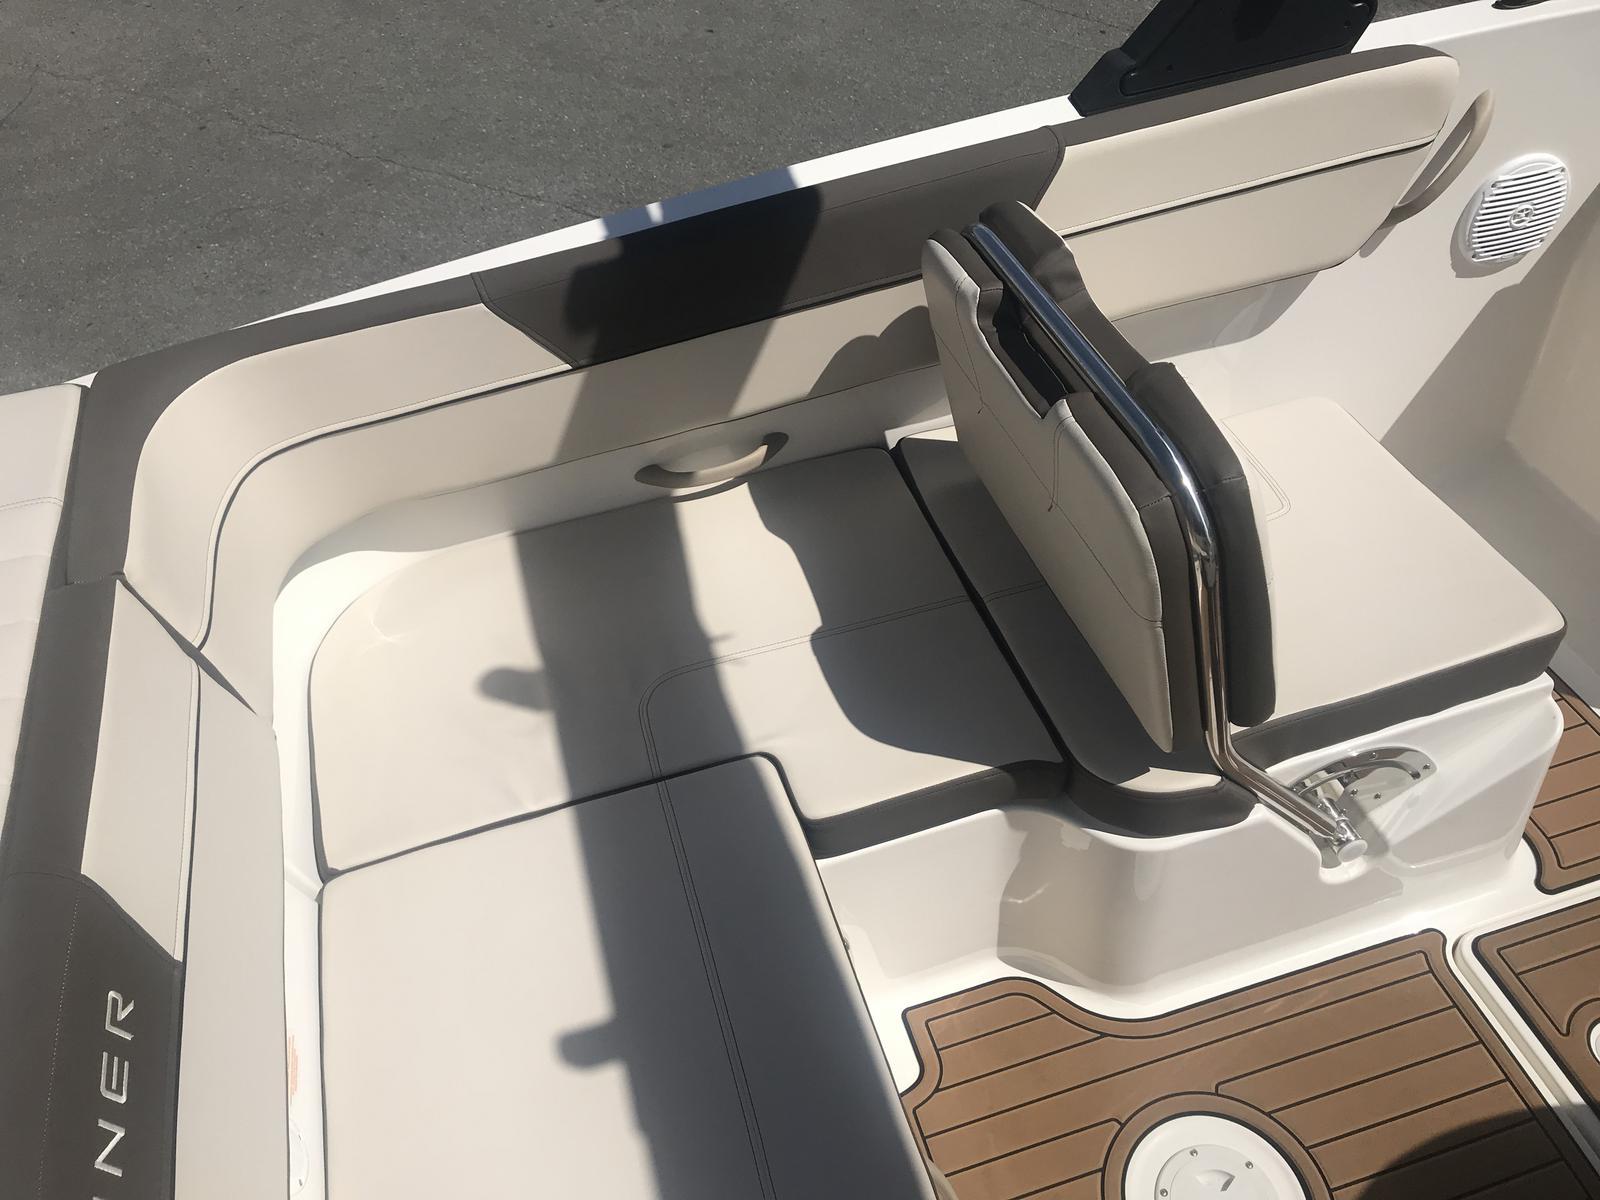 2018 Bayliner boat for sale, model of the boat is VR6 Bowrider & Image # 3 of 6